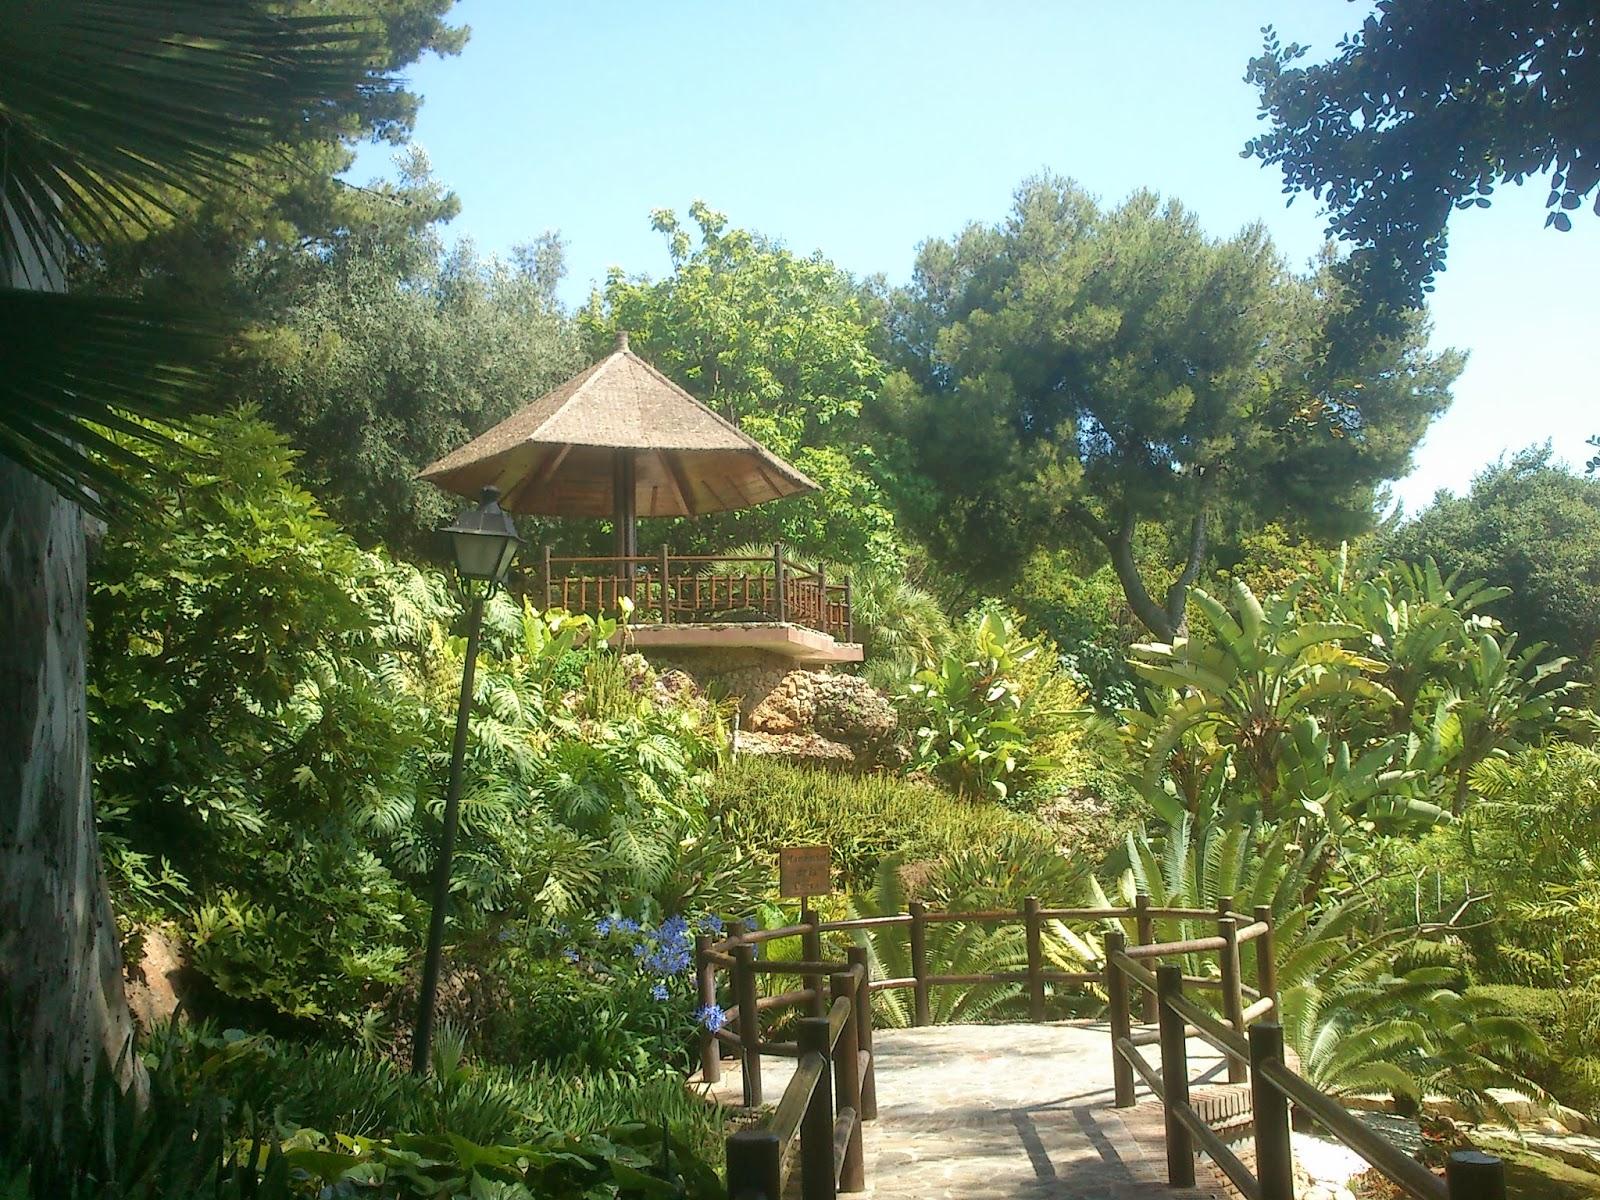 Medio ambiente urbano imfe m laga jard n bot nico for Jardin botanico torremolinos